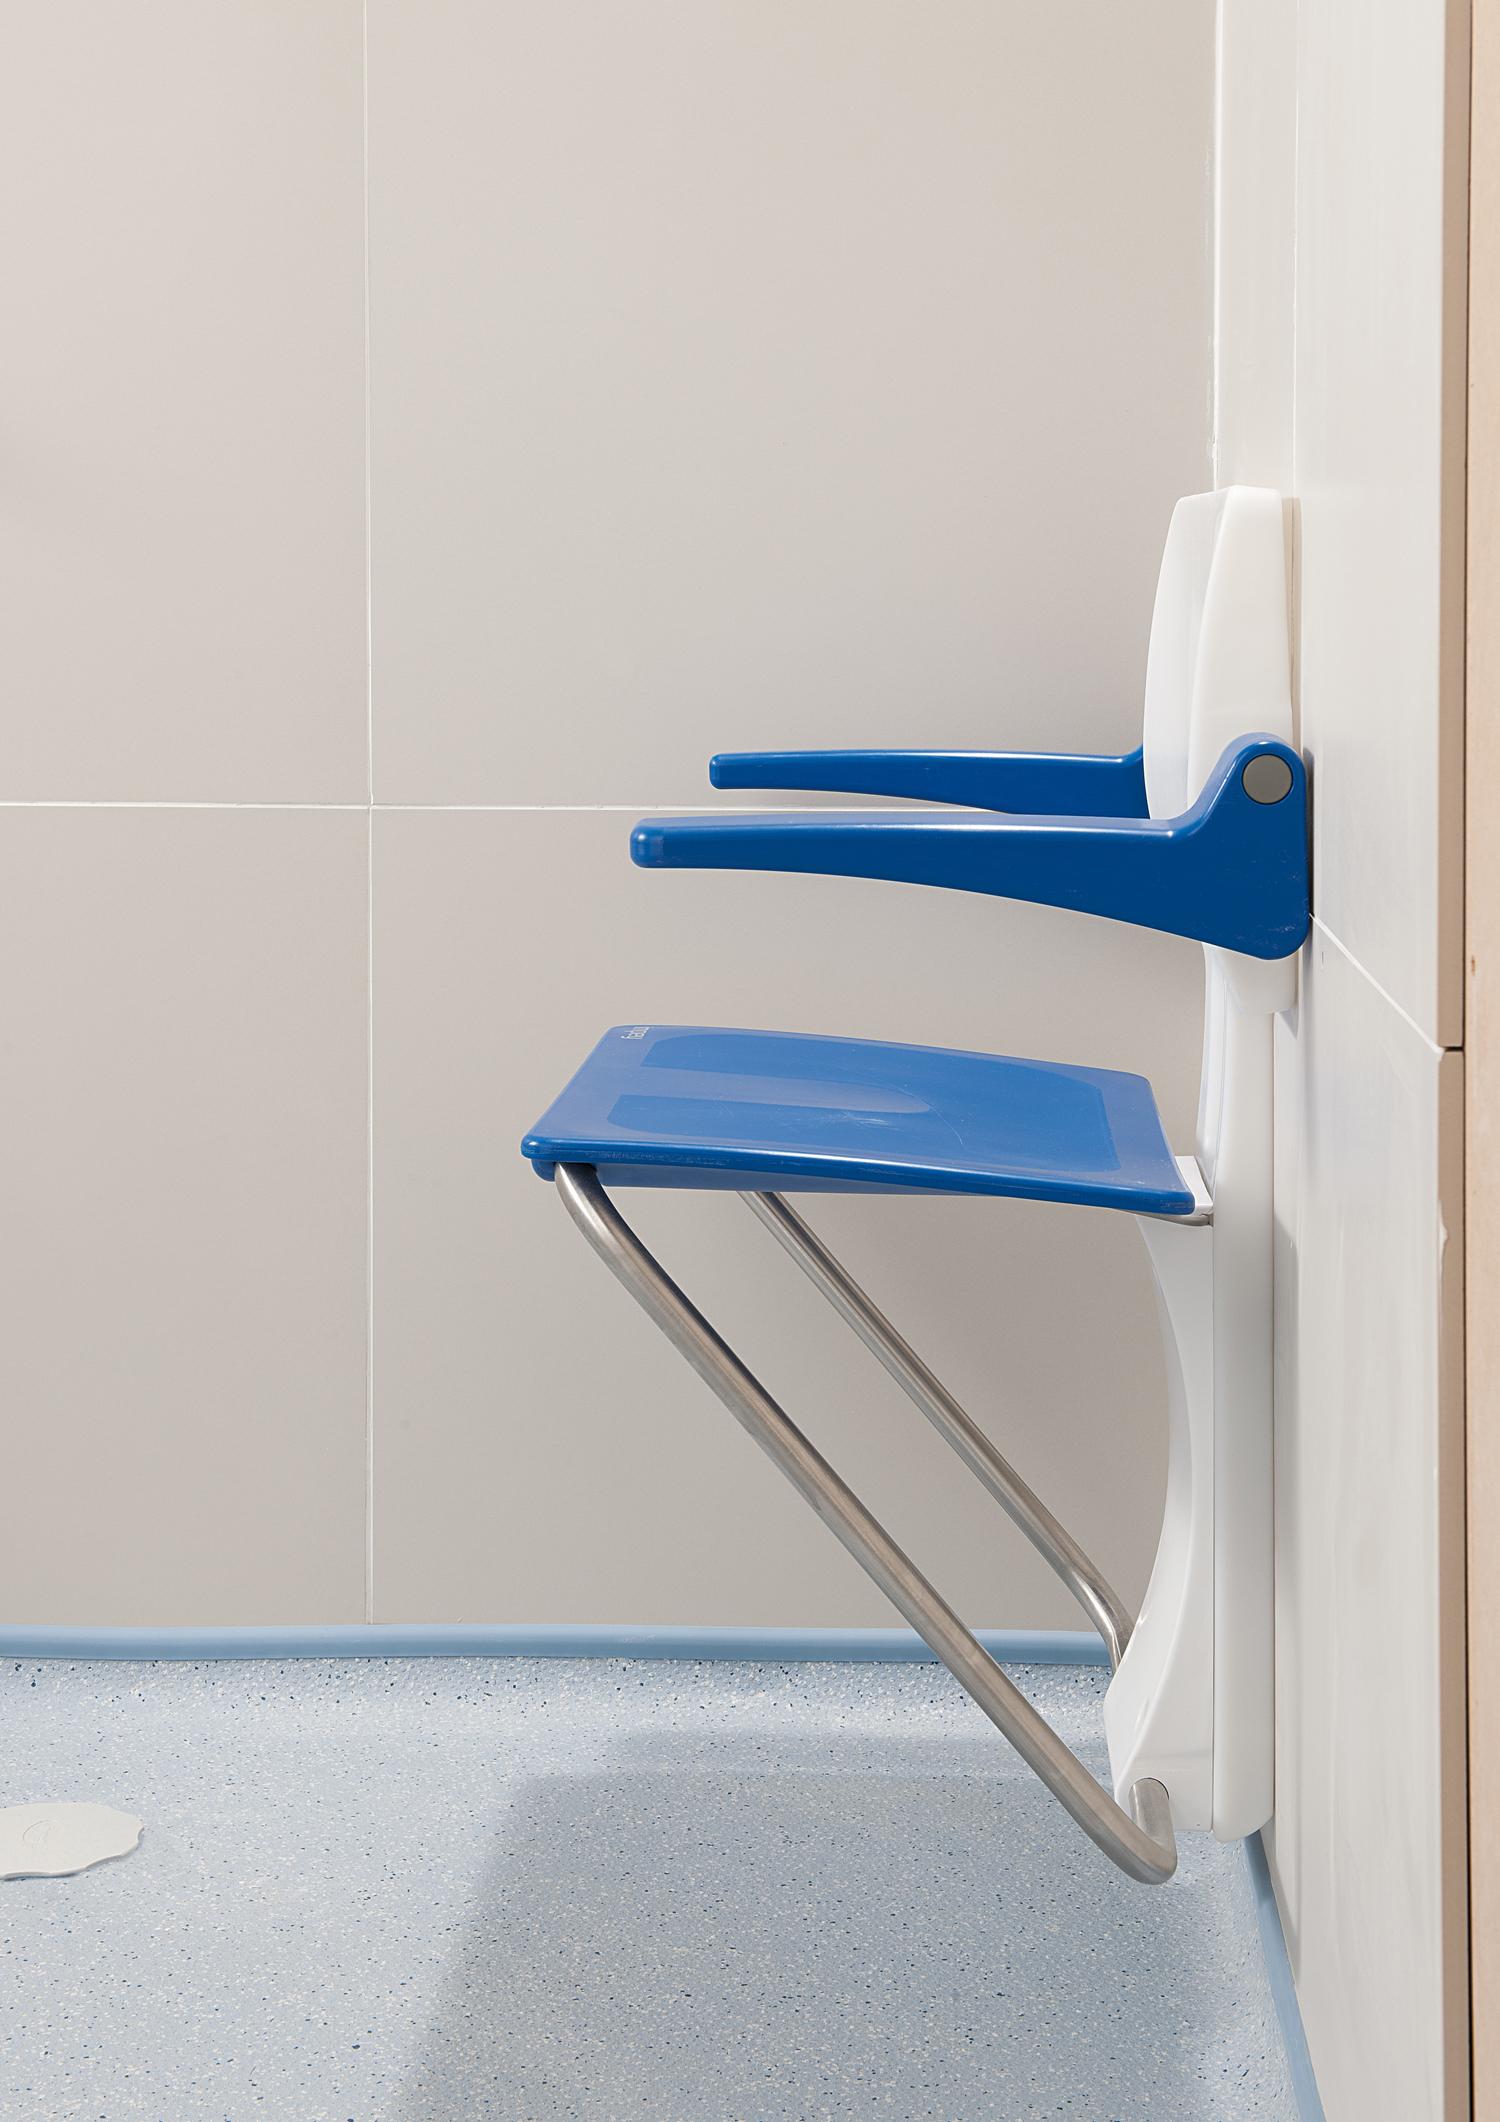 Slimfold Shower Seat Stylish Shower Seating Practical